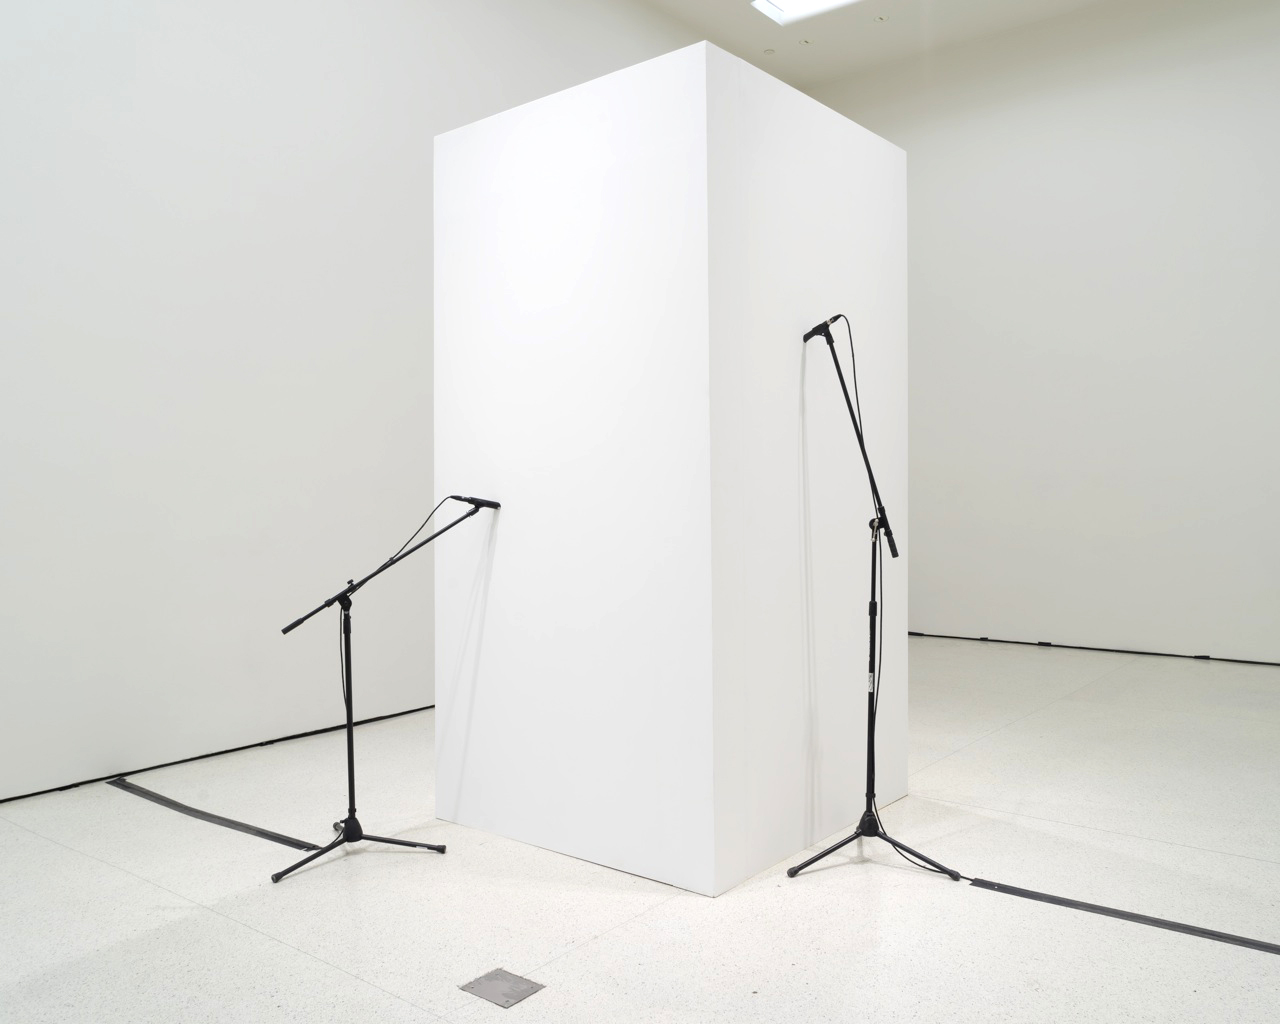 Photo: Krisopher McKay, © Solomon R. Guggenheim Foundation, New York.